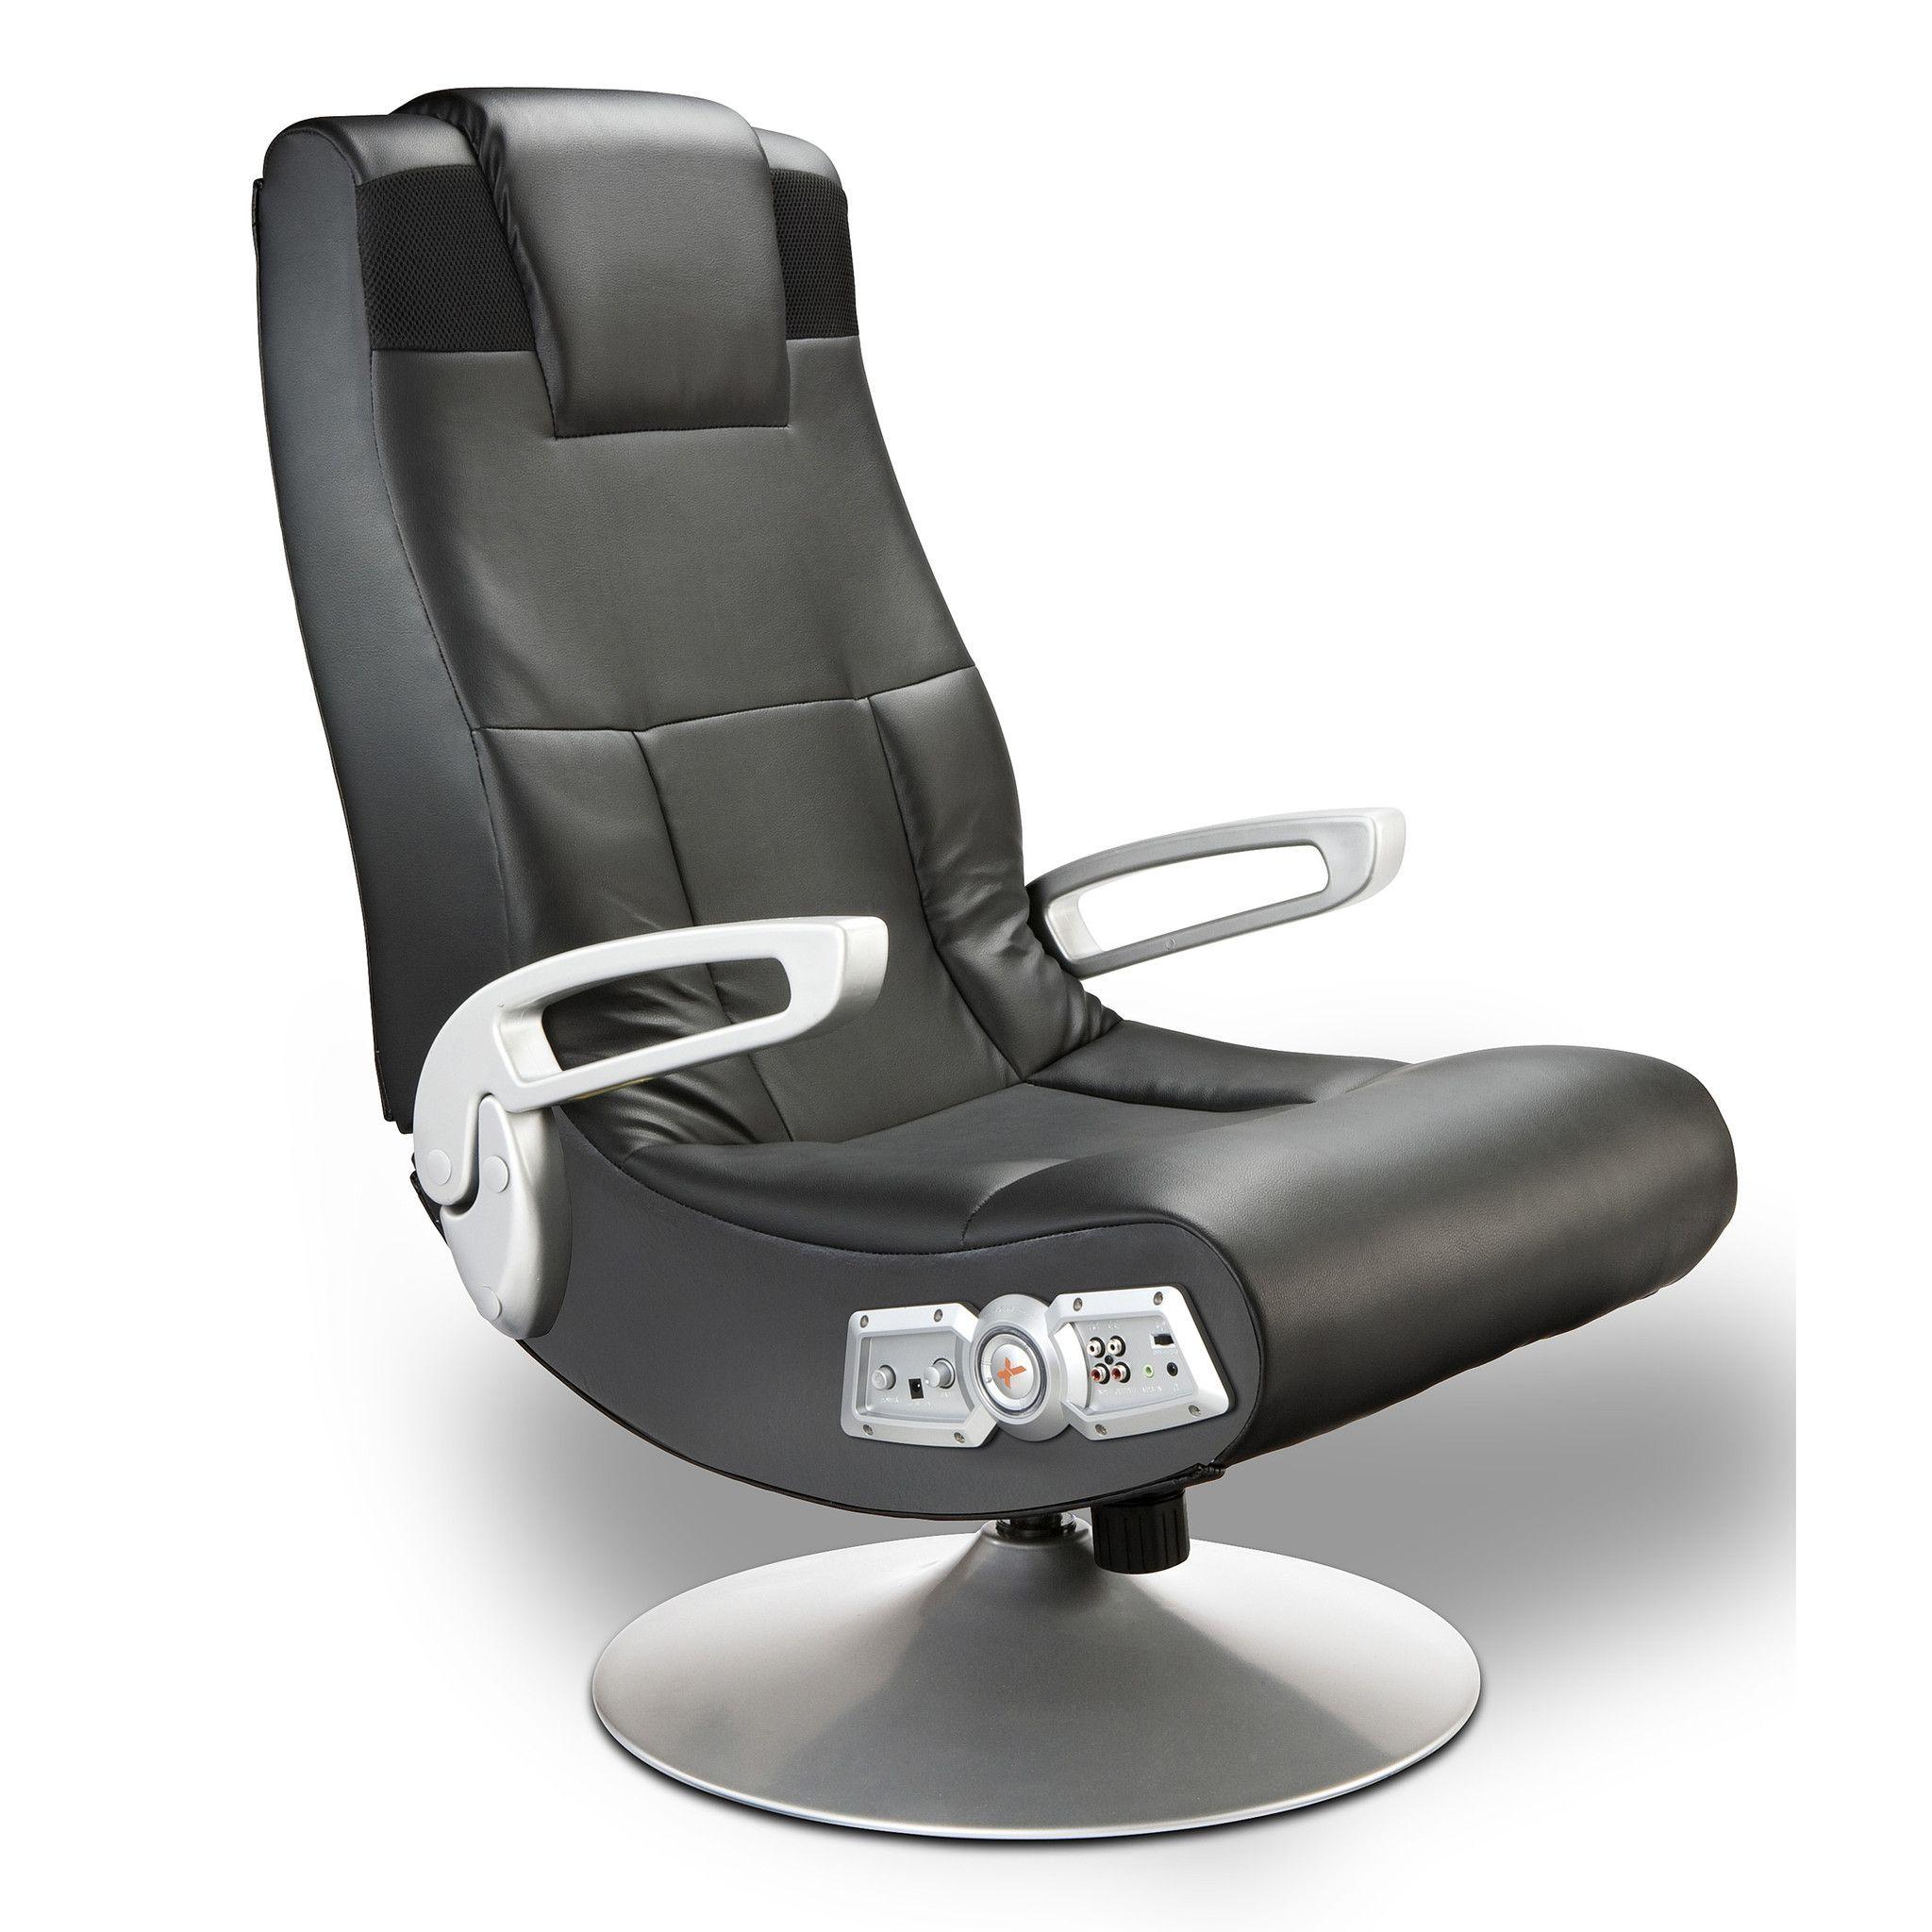 Michael Anthony Furniture XPedestal Black Pro Series